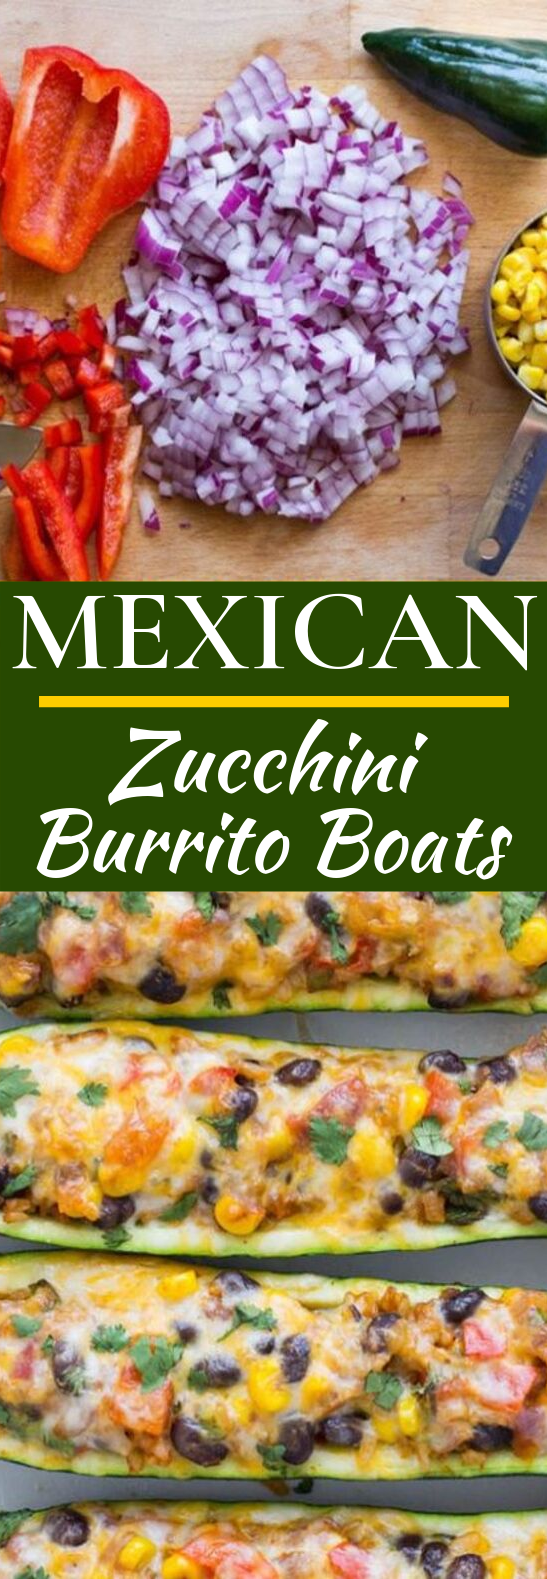 Mexican Zucchini Burrito Boats #vegetarian #appetizers